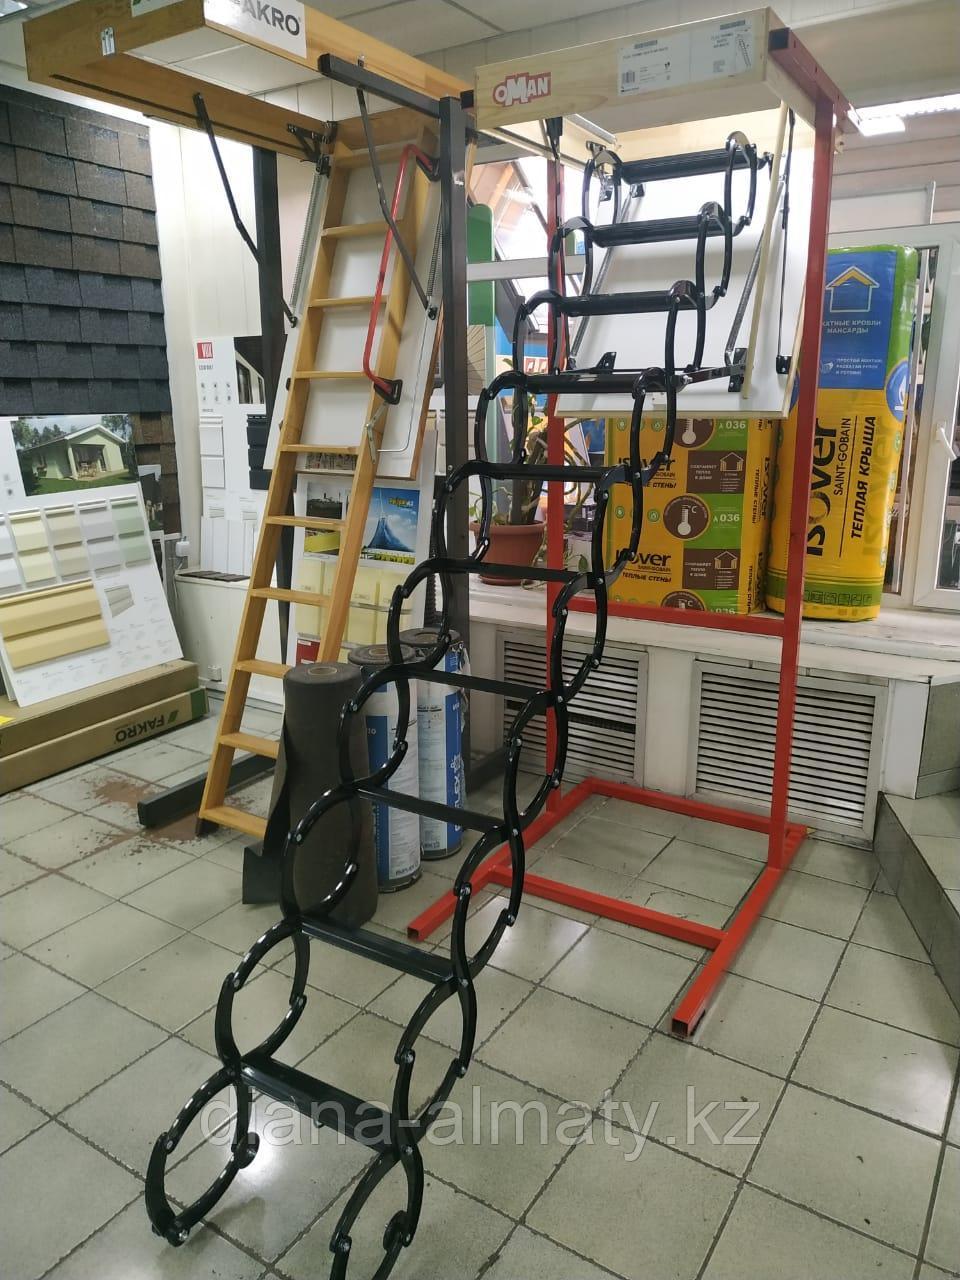 Металлическая лестница Oman (60х90х290 см) Польша Whats App.+7 (707) 5705151